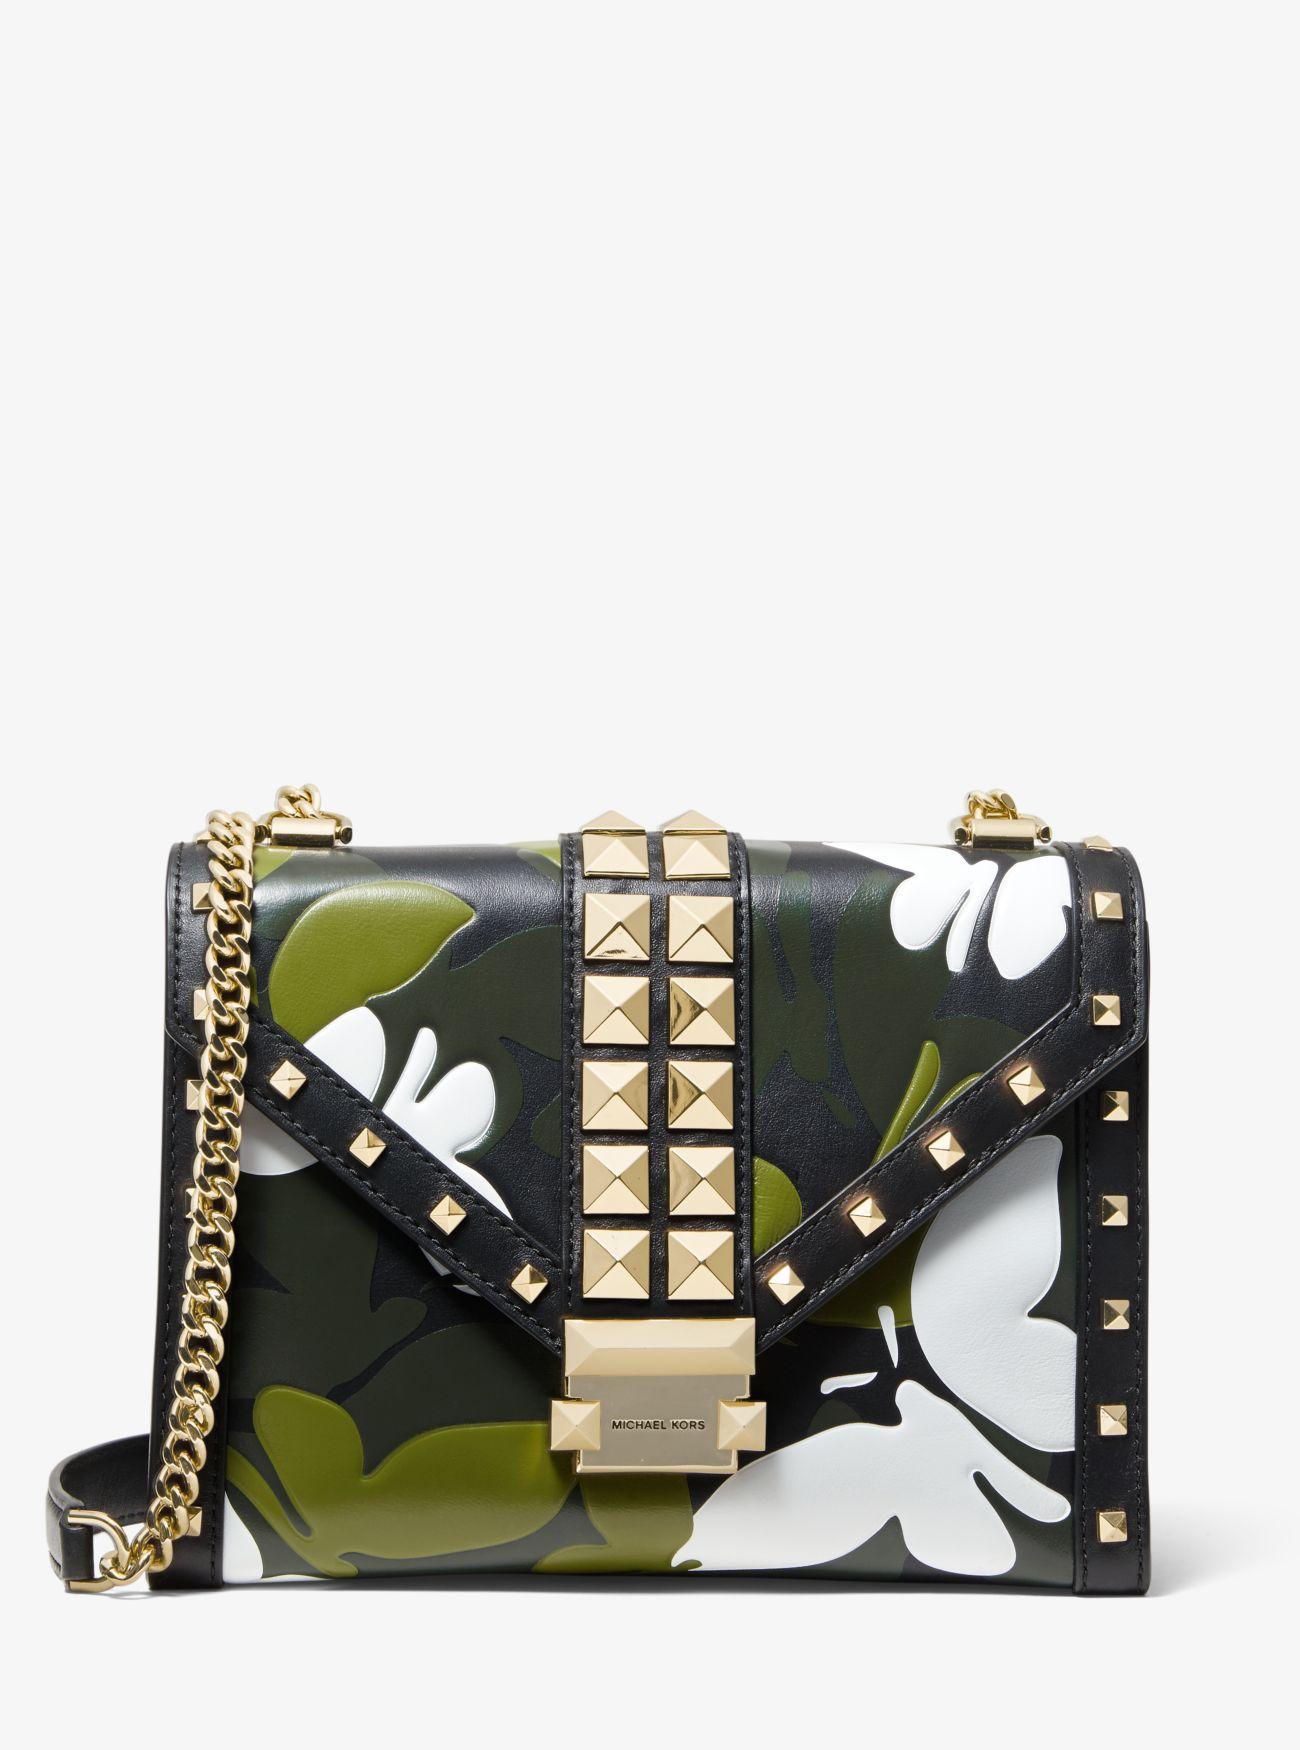 62c423b81fdeed MICHAEL Michael Kors. Women's Black Whitney Large Butterfly Camo  Convertible Shoulder Bag